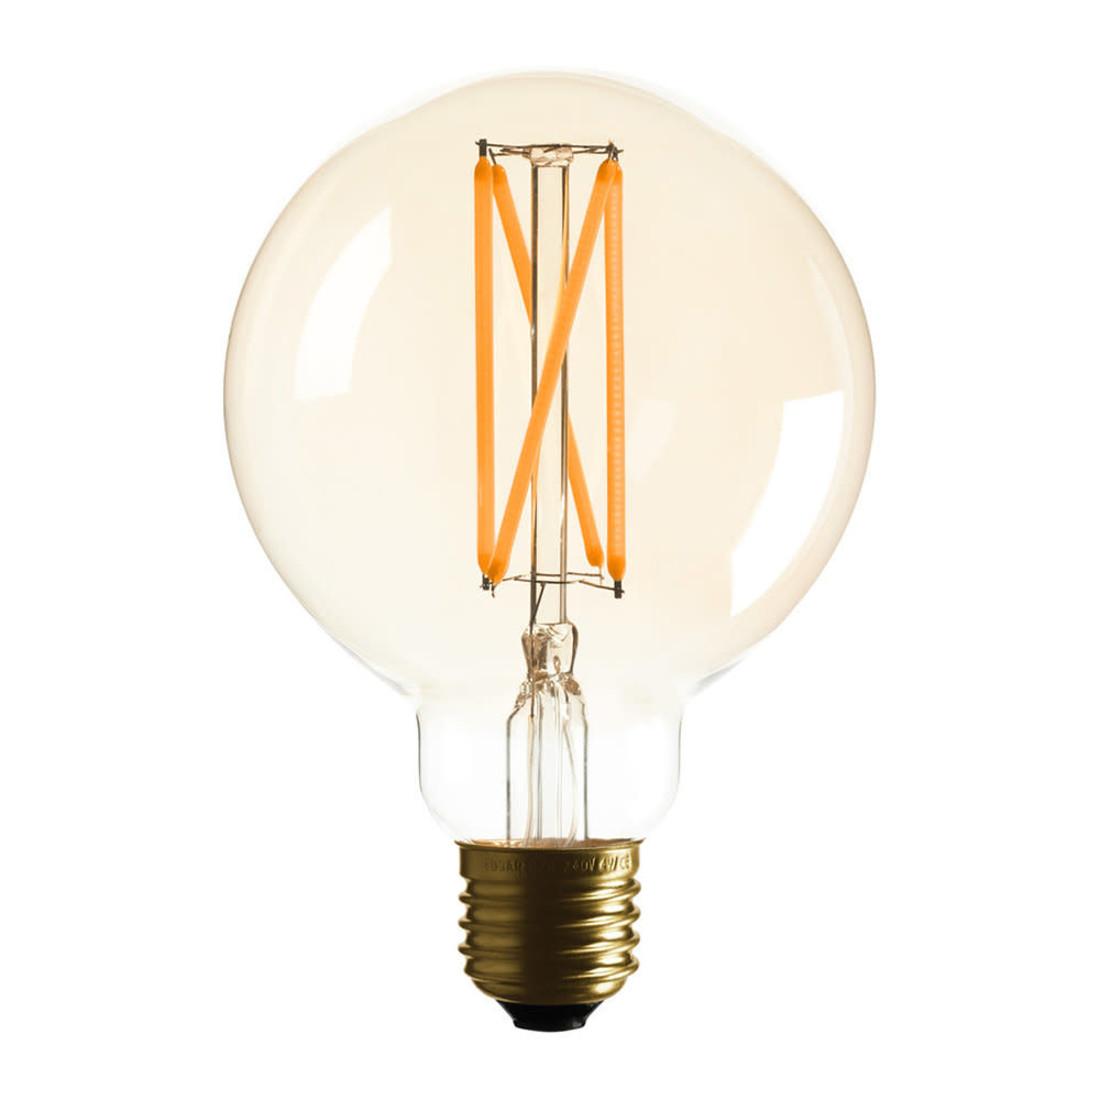 Kugel-Glühbirne